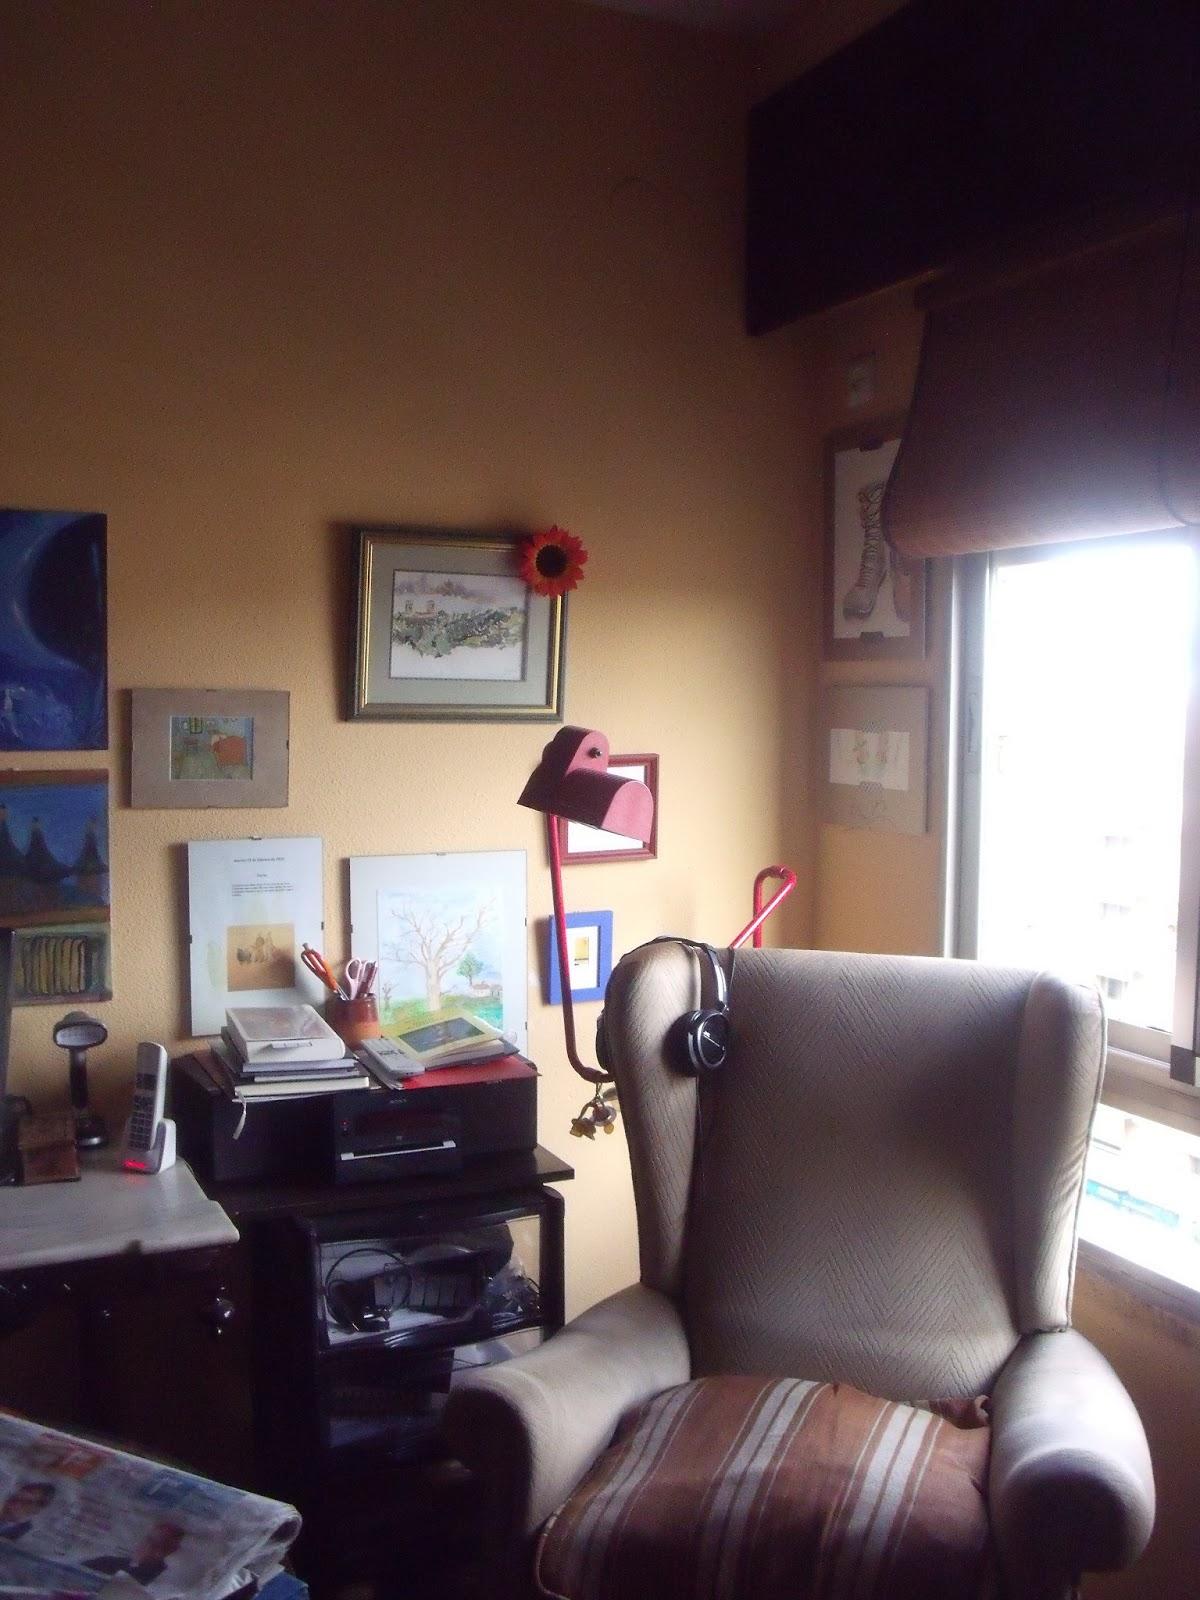 Tracycorrecaminos fiesta virtual homenaje a mi sill n - Sillon para leer ...